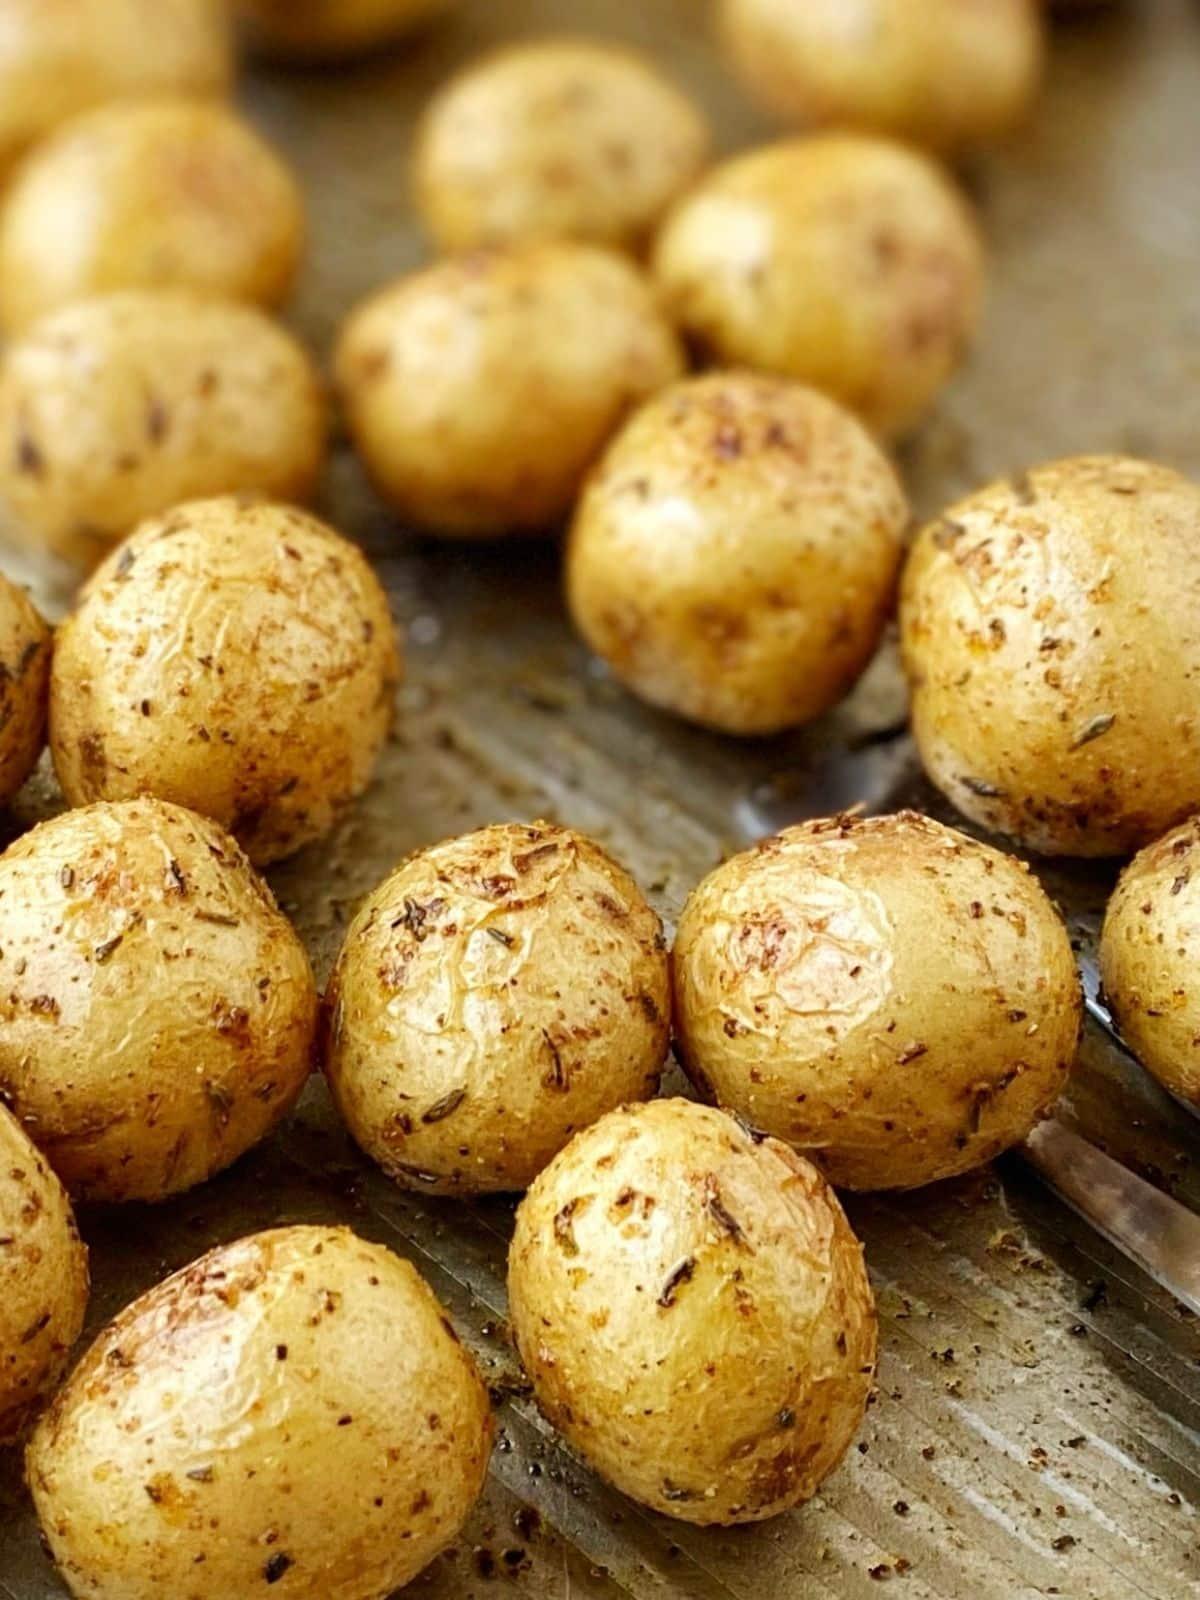 close up of potatoes on the sheet pan